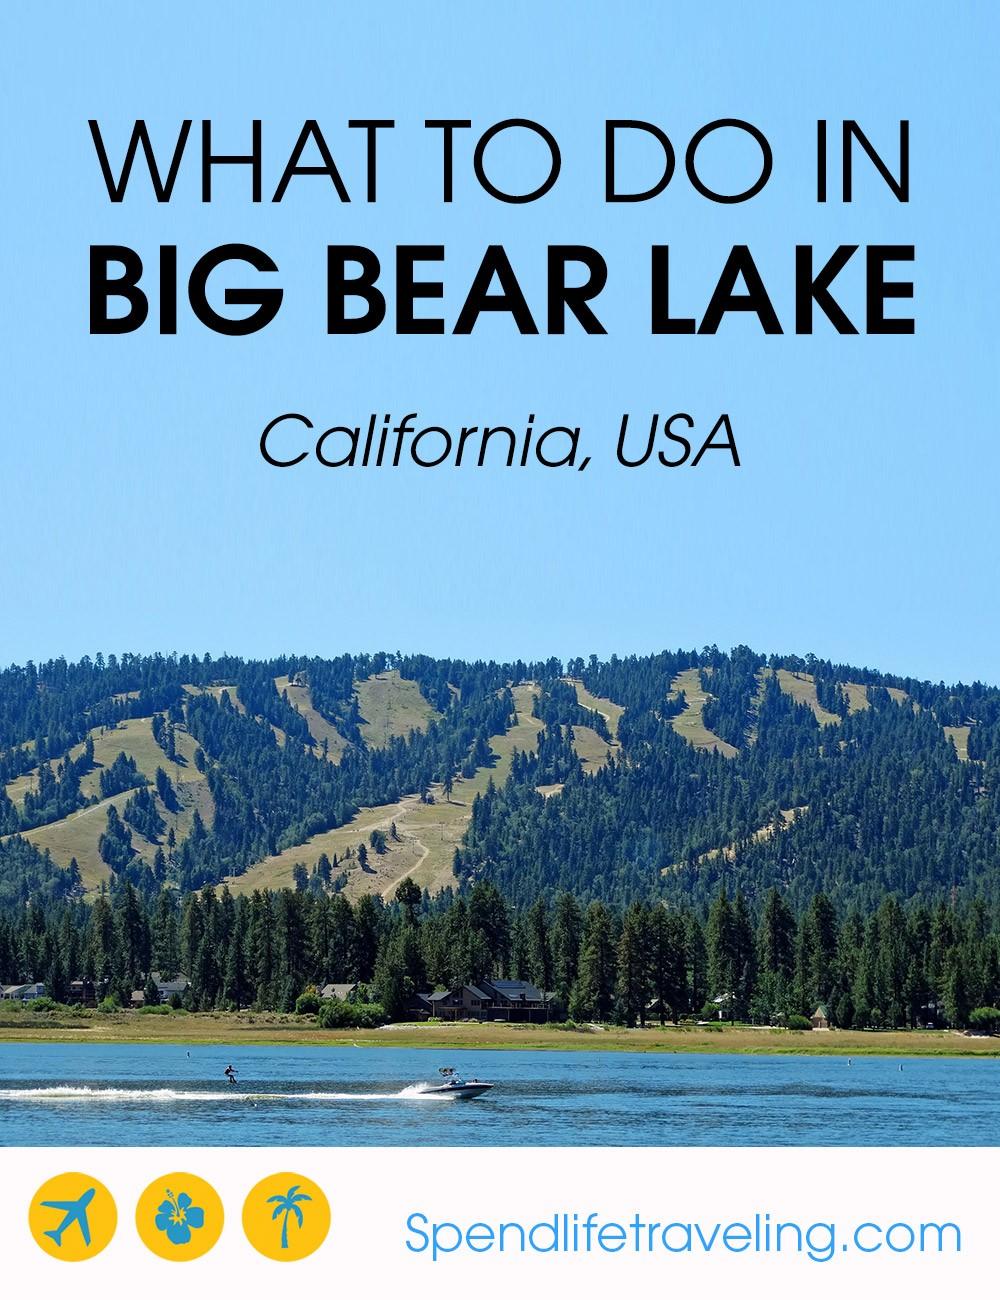 What to do on a weekend trip to Big Bear, California. #bigbearlake #travelcalifornia #bigbear